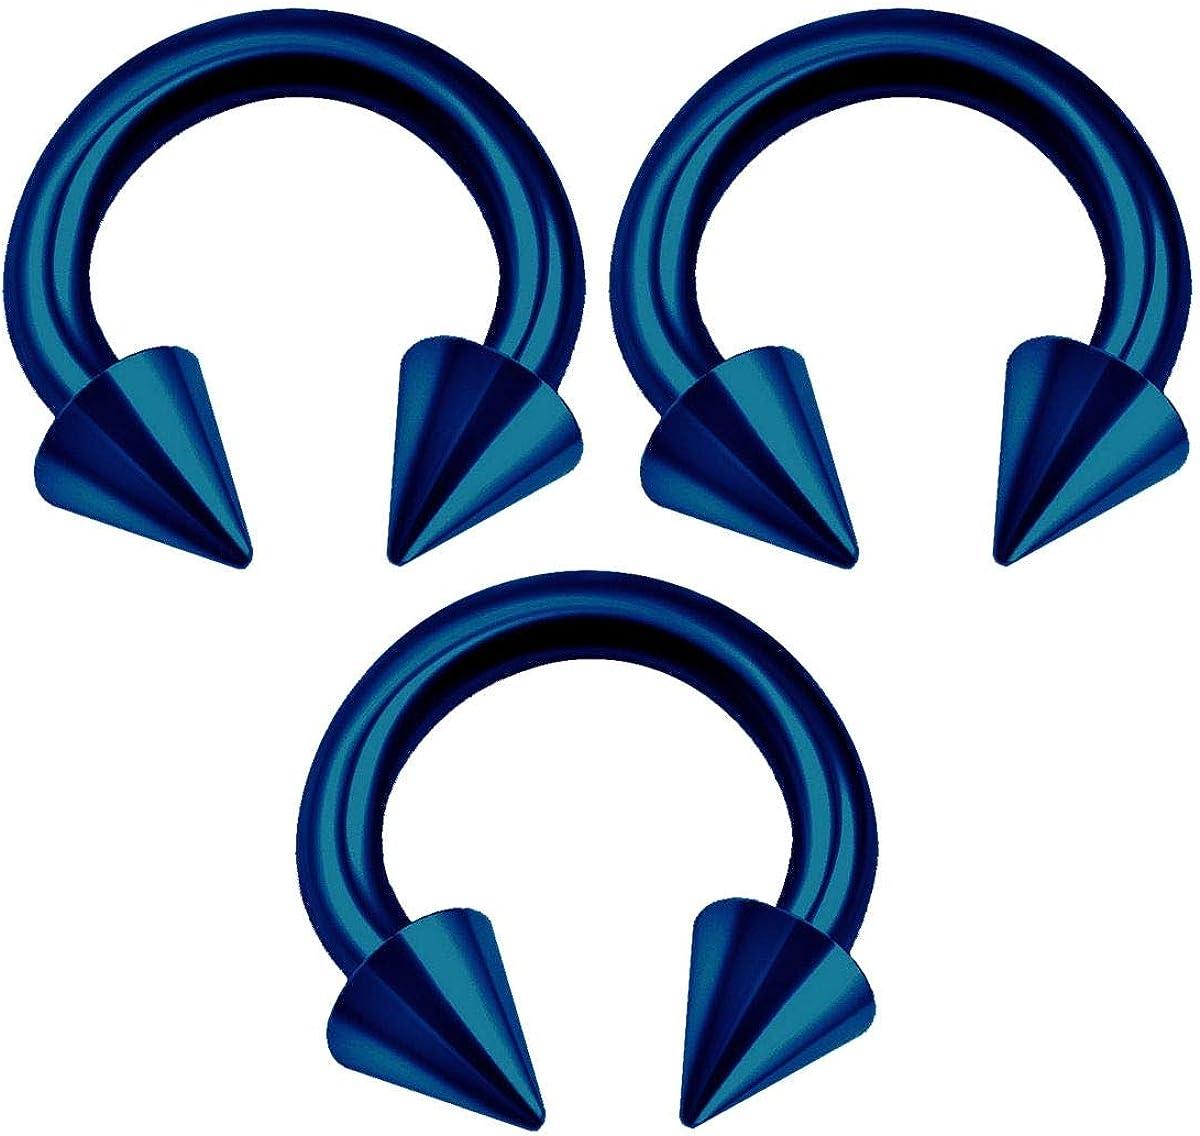 BanaVega 3PCS Surgical Steel Dark Blue Horseshoe Barbell 16g 3mm Spike Tragus Daith Lip Earrings Septum Piercing Jewelry Choose Sizes